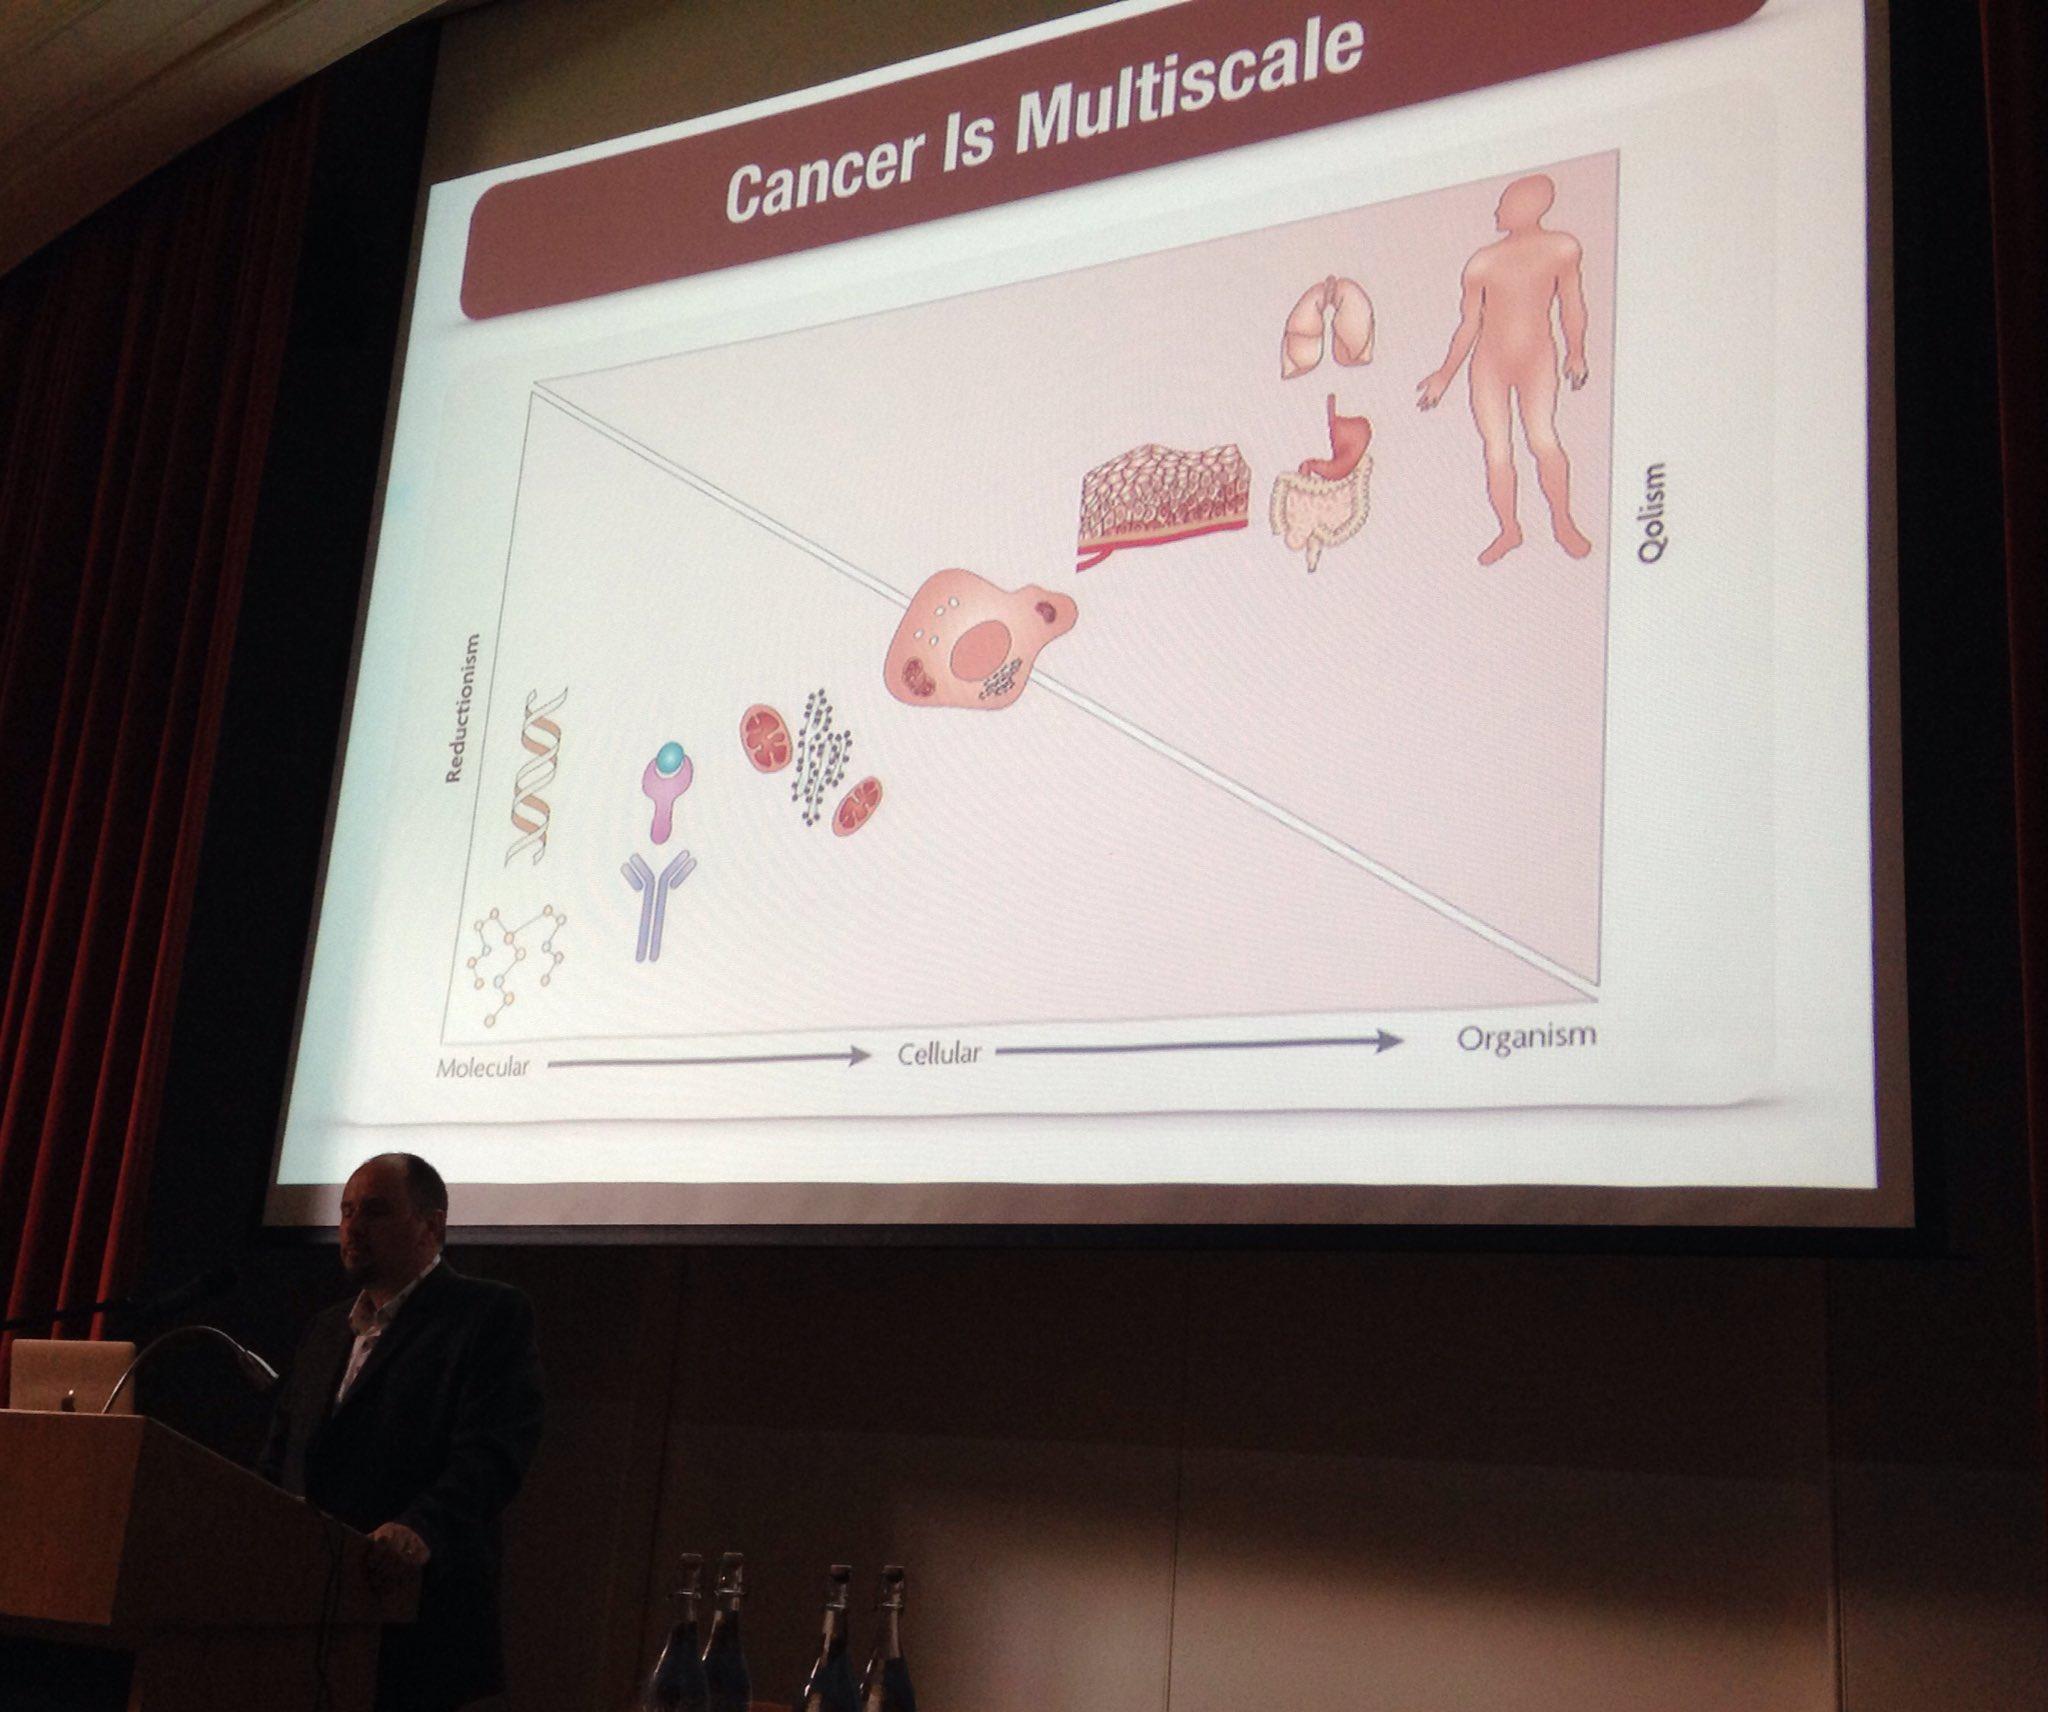 @ara_anderson describing multiscale nature of cancer data #sebmsc16 https://t.co/l0Z8Br5Lhg